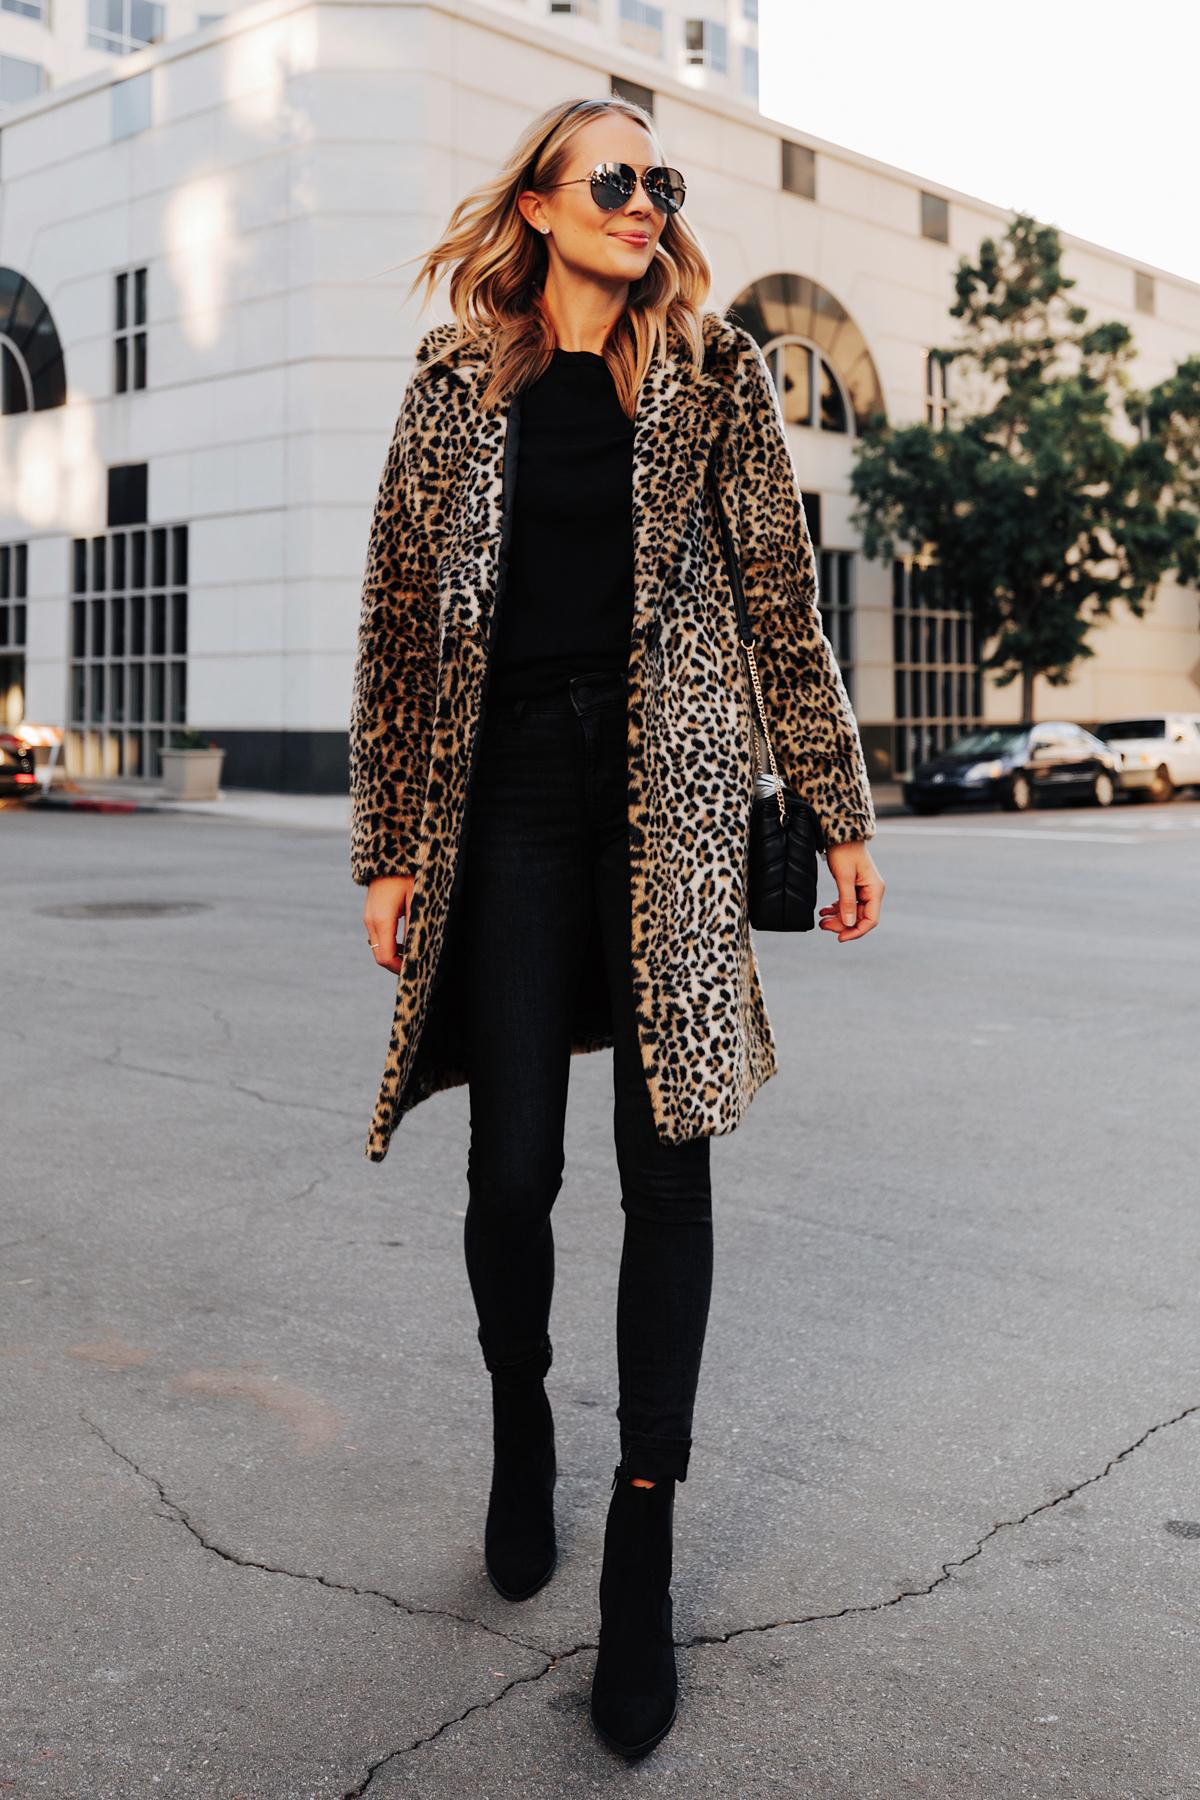 Fashion Jackson Wearing Express Faux Fur Leopard Coat Black Sweater Black Jeans Black Booties